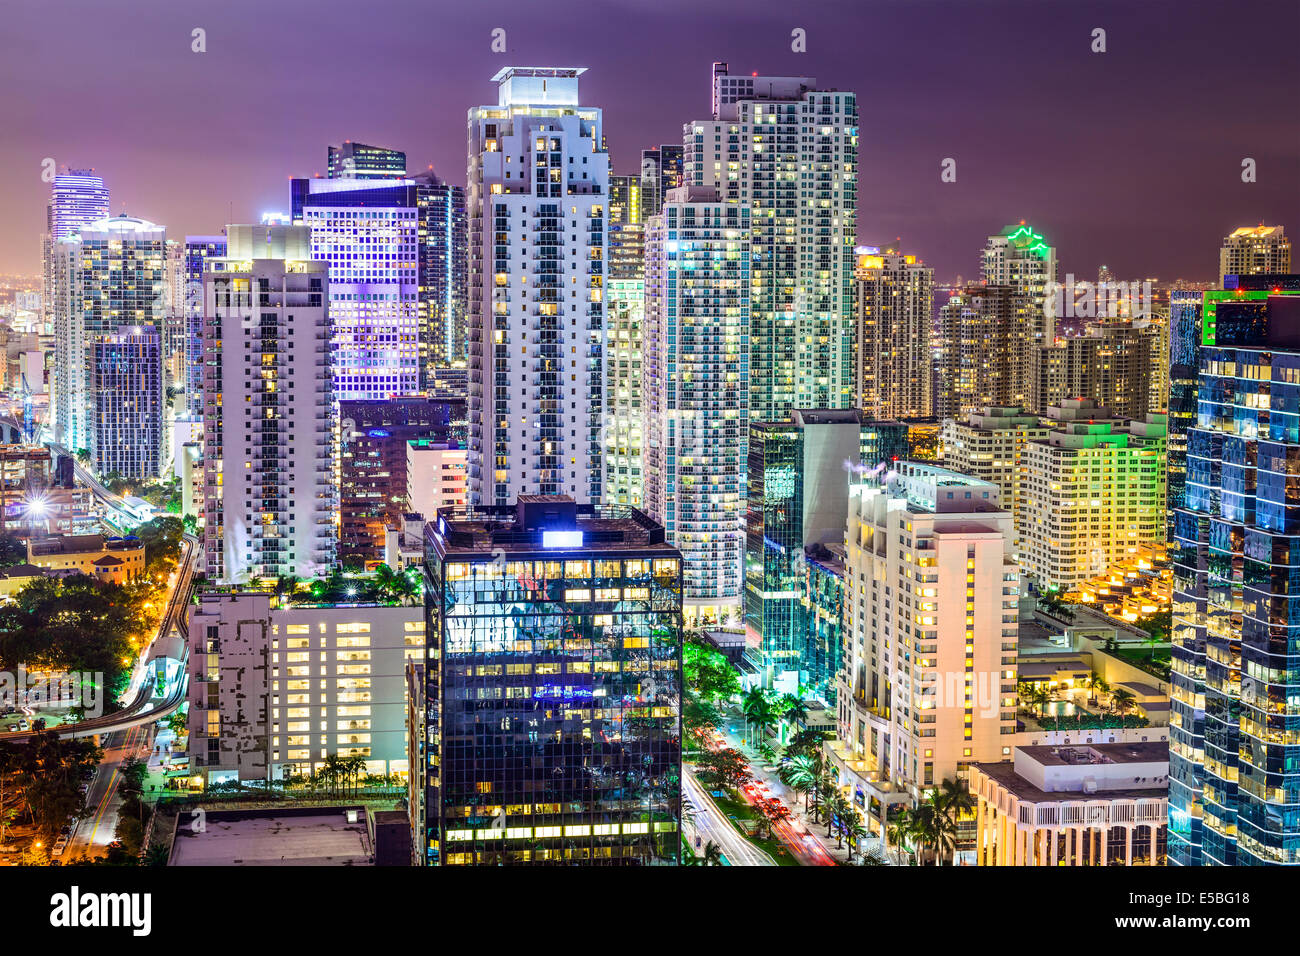 Miami, Floride, USA Centre-ville paysage urbain. Photo Stock